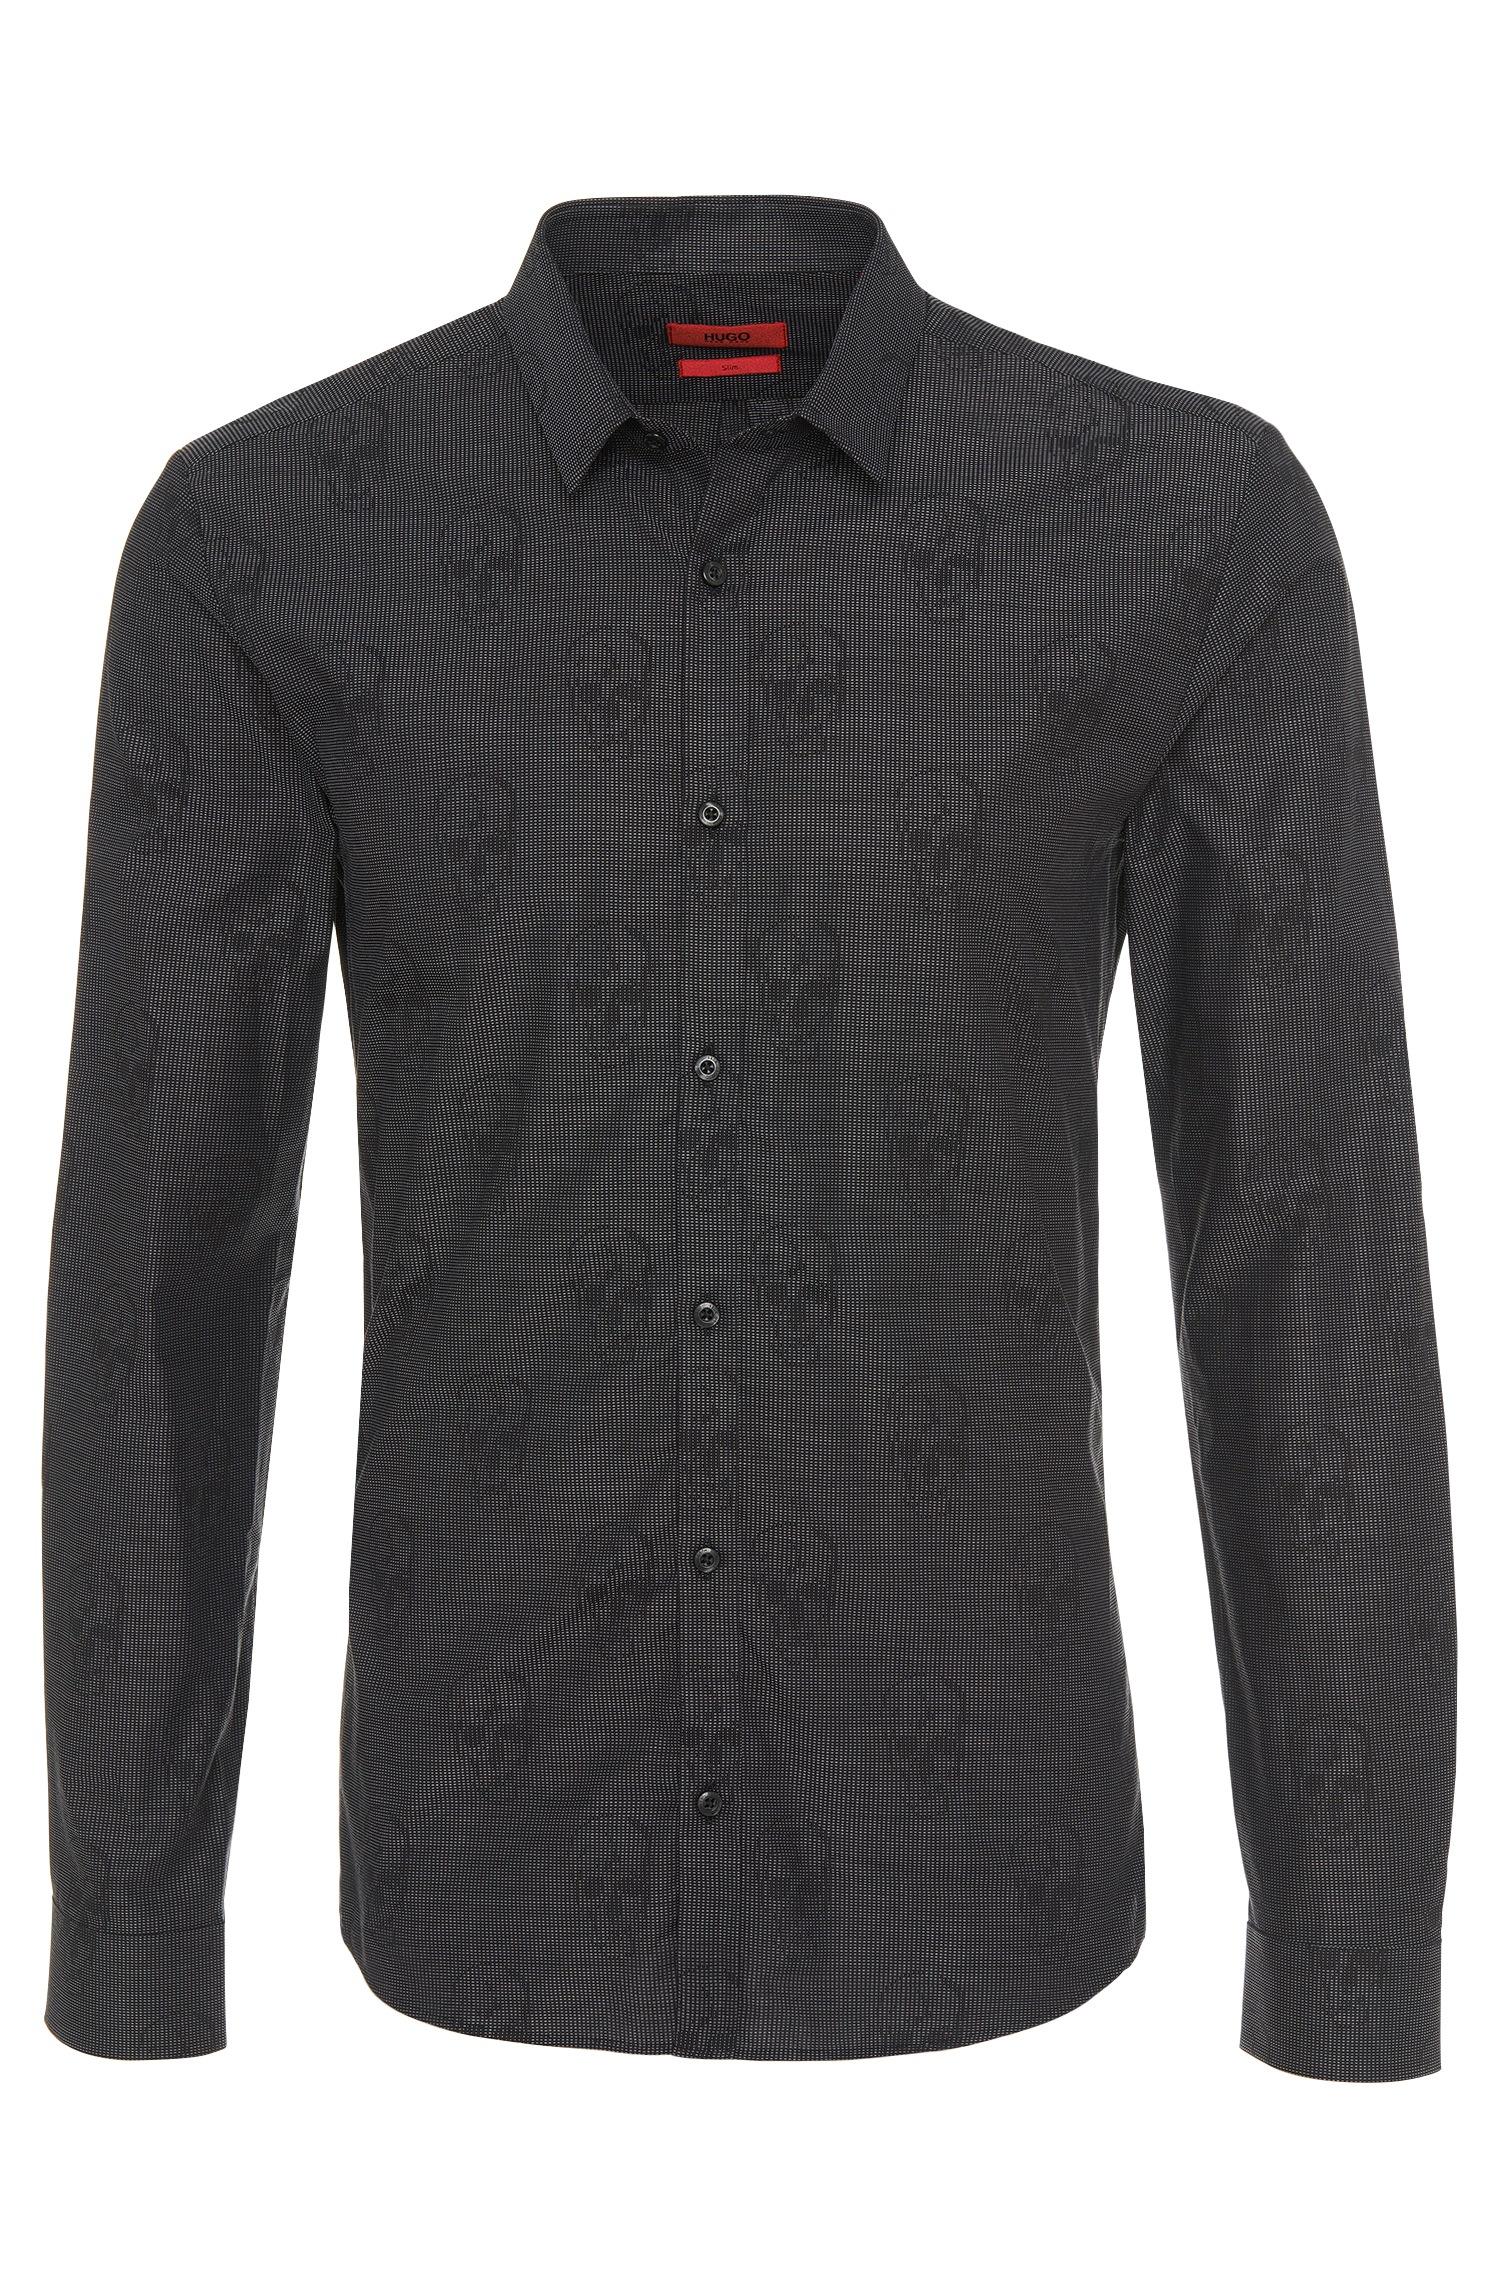 be63ef503c5 HUGO Slim-fit Shirt In Cotton   ero3  in Black for Men - Lyst